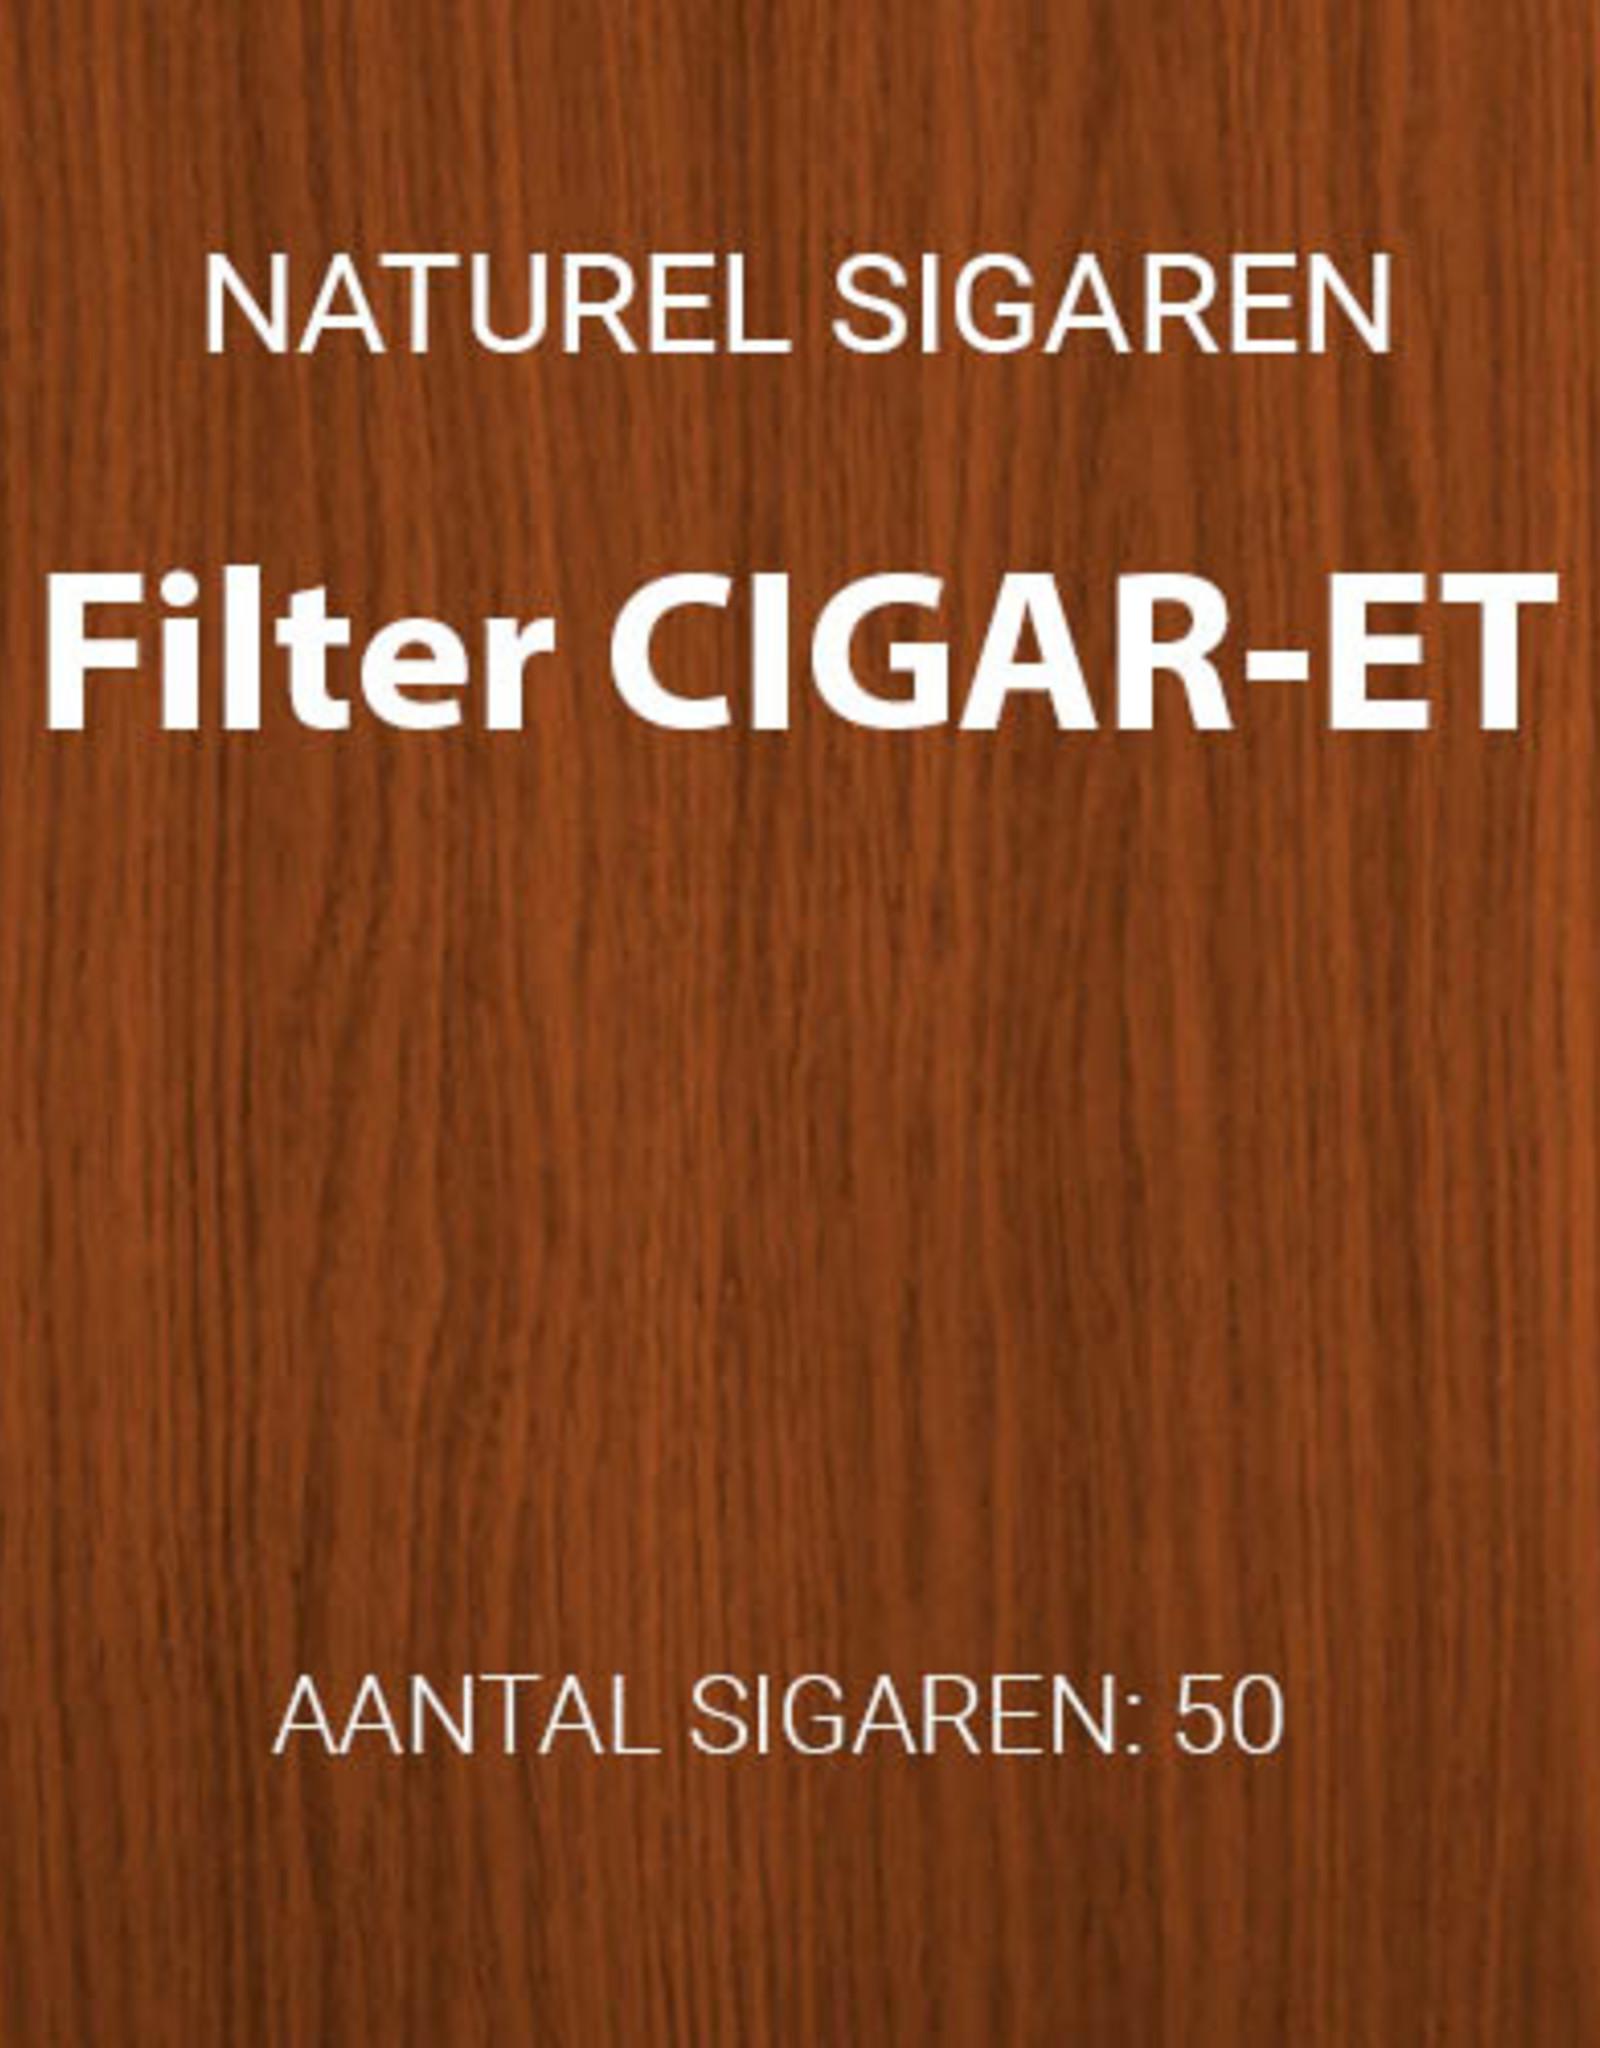 Filter Cigar-et